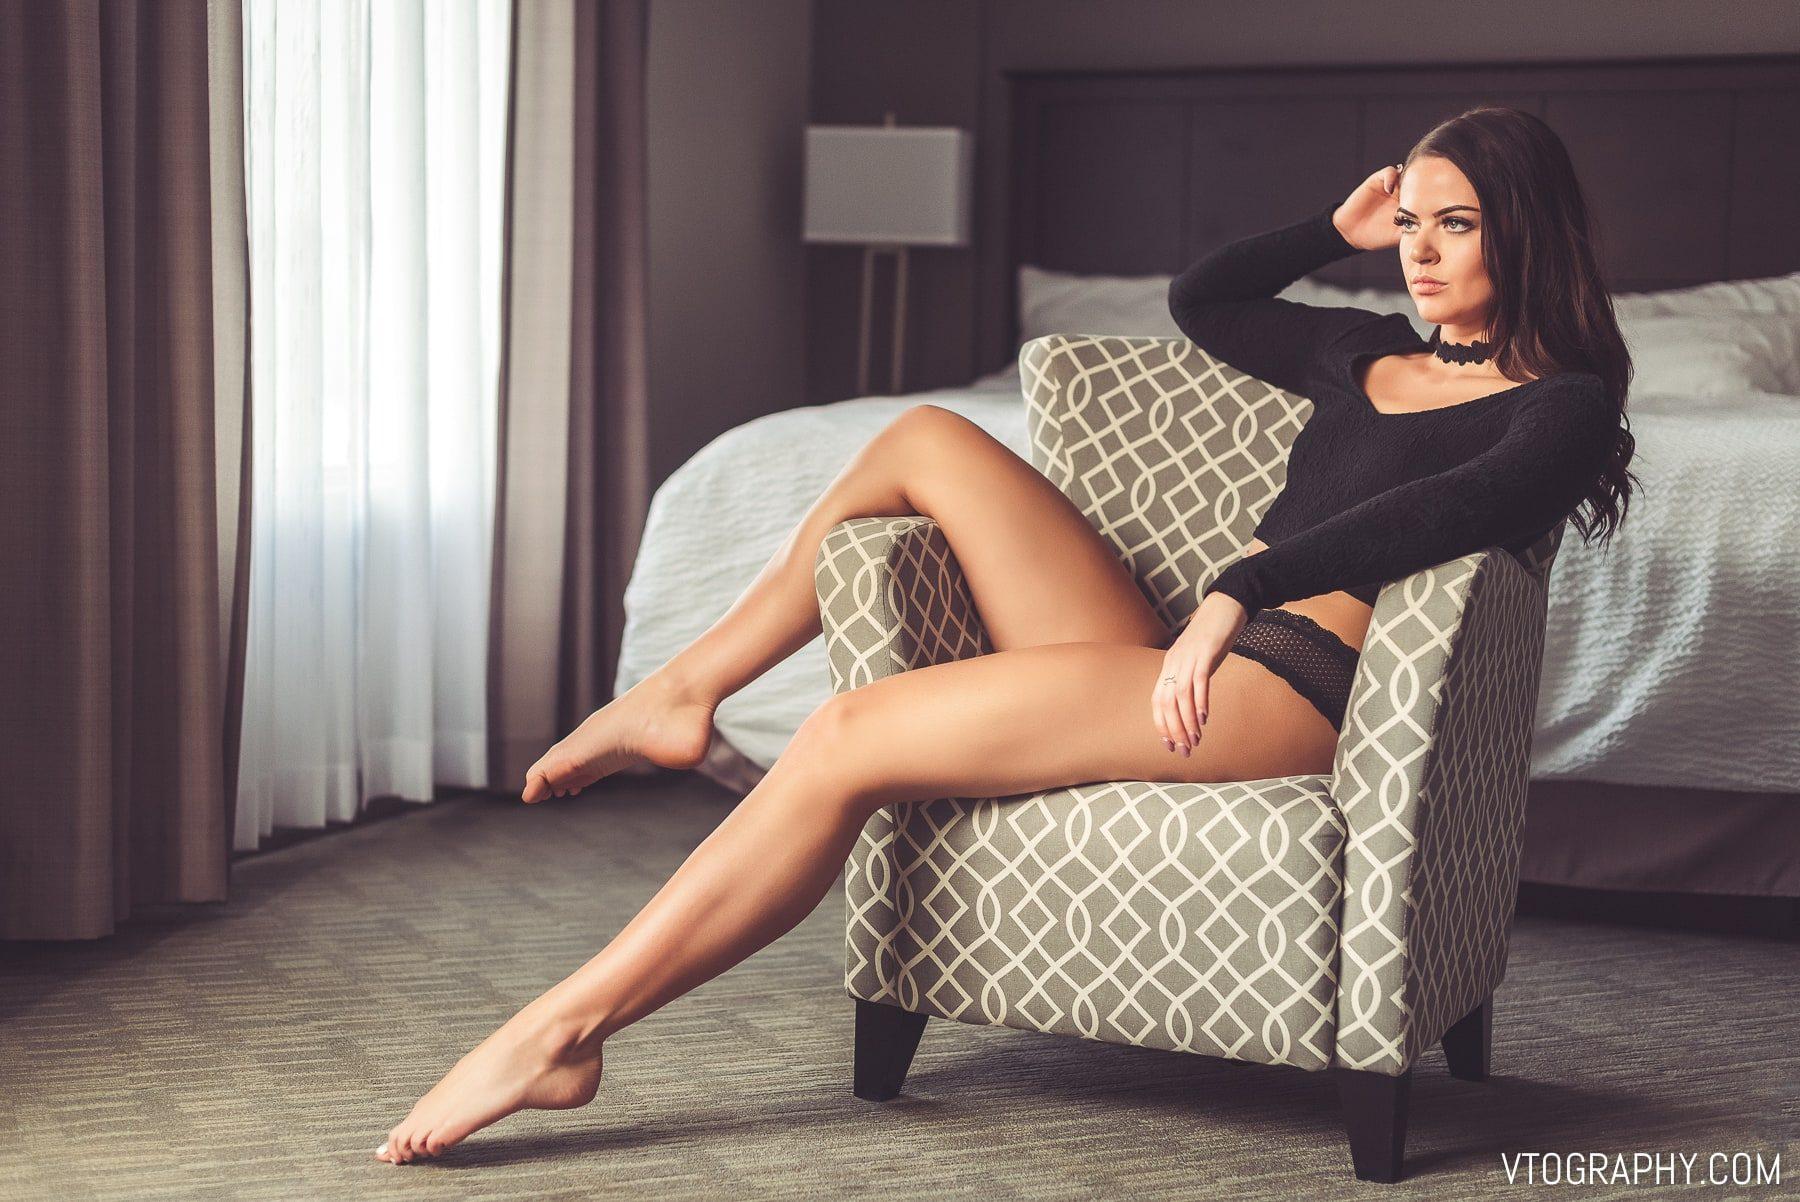 Boudoir photo shoot with model Kelsie